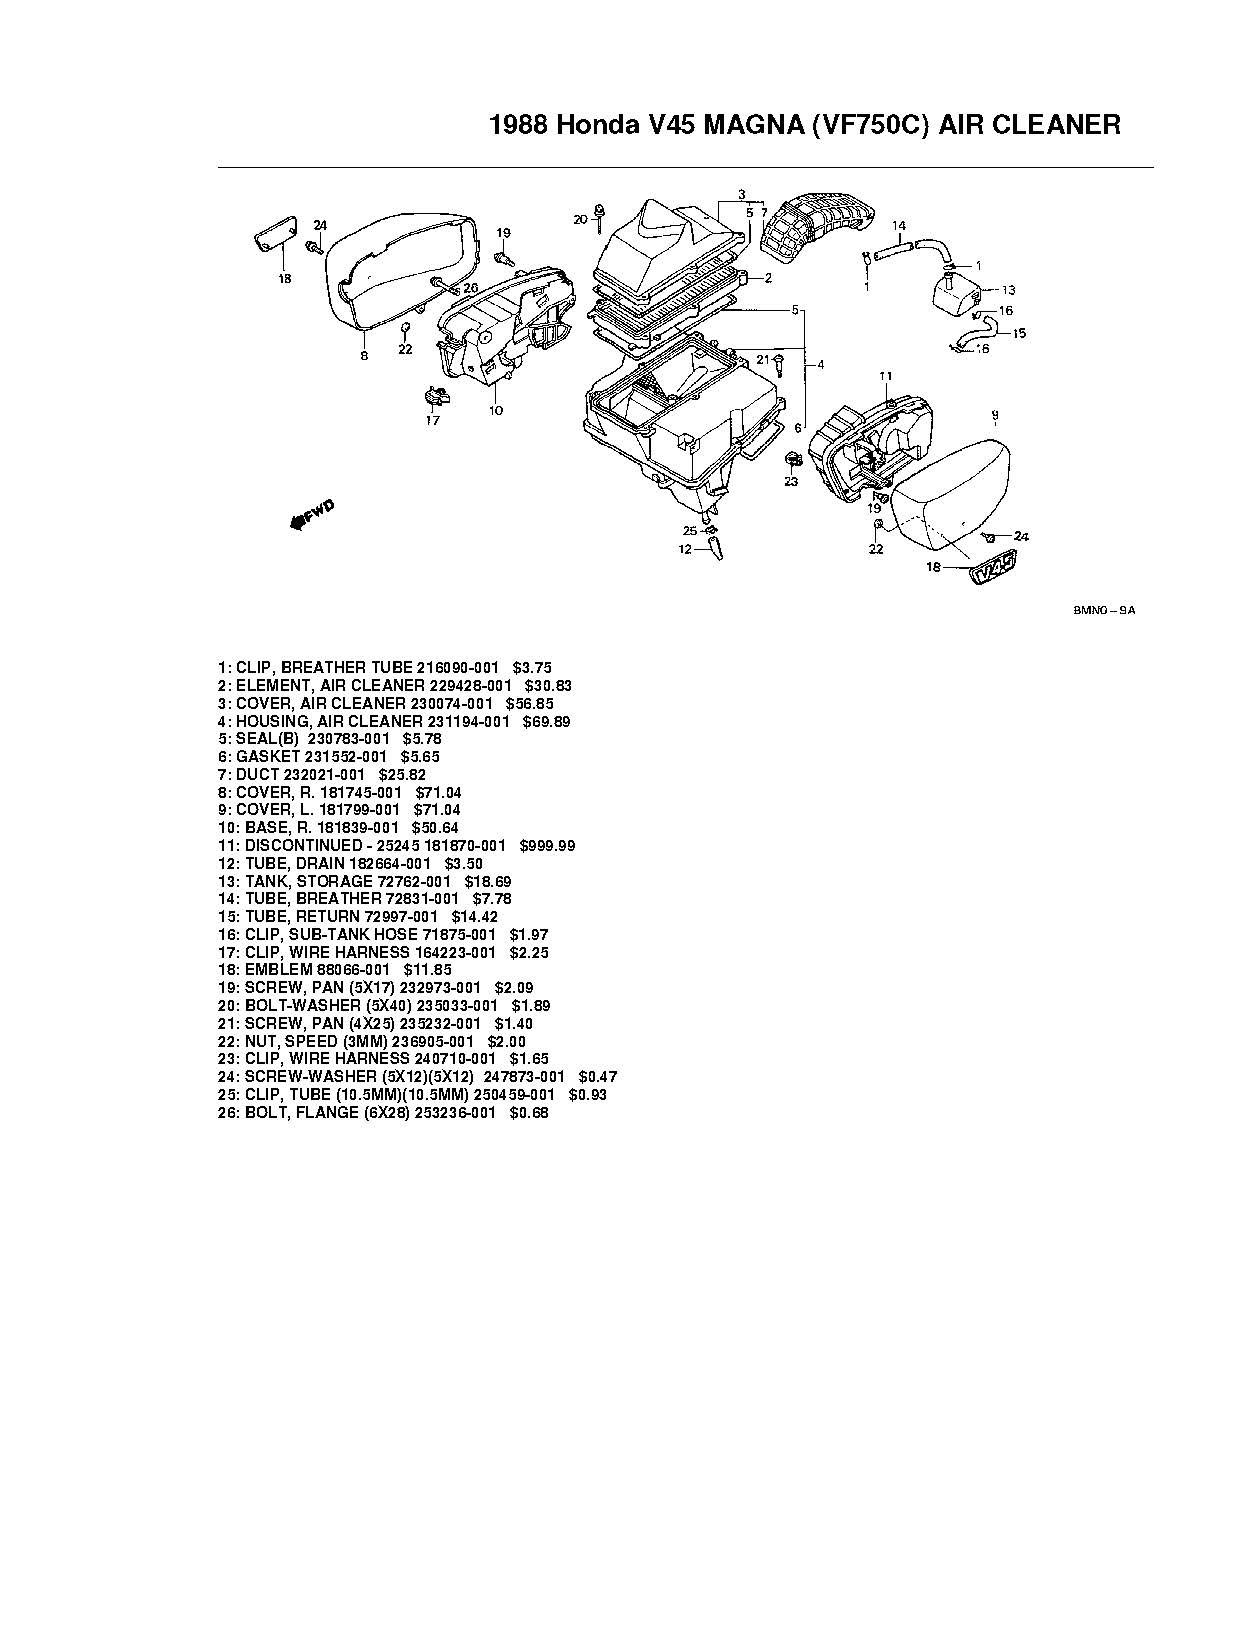 Parts list for Honda VF750C (1988)